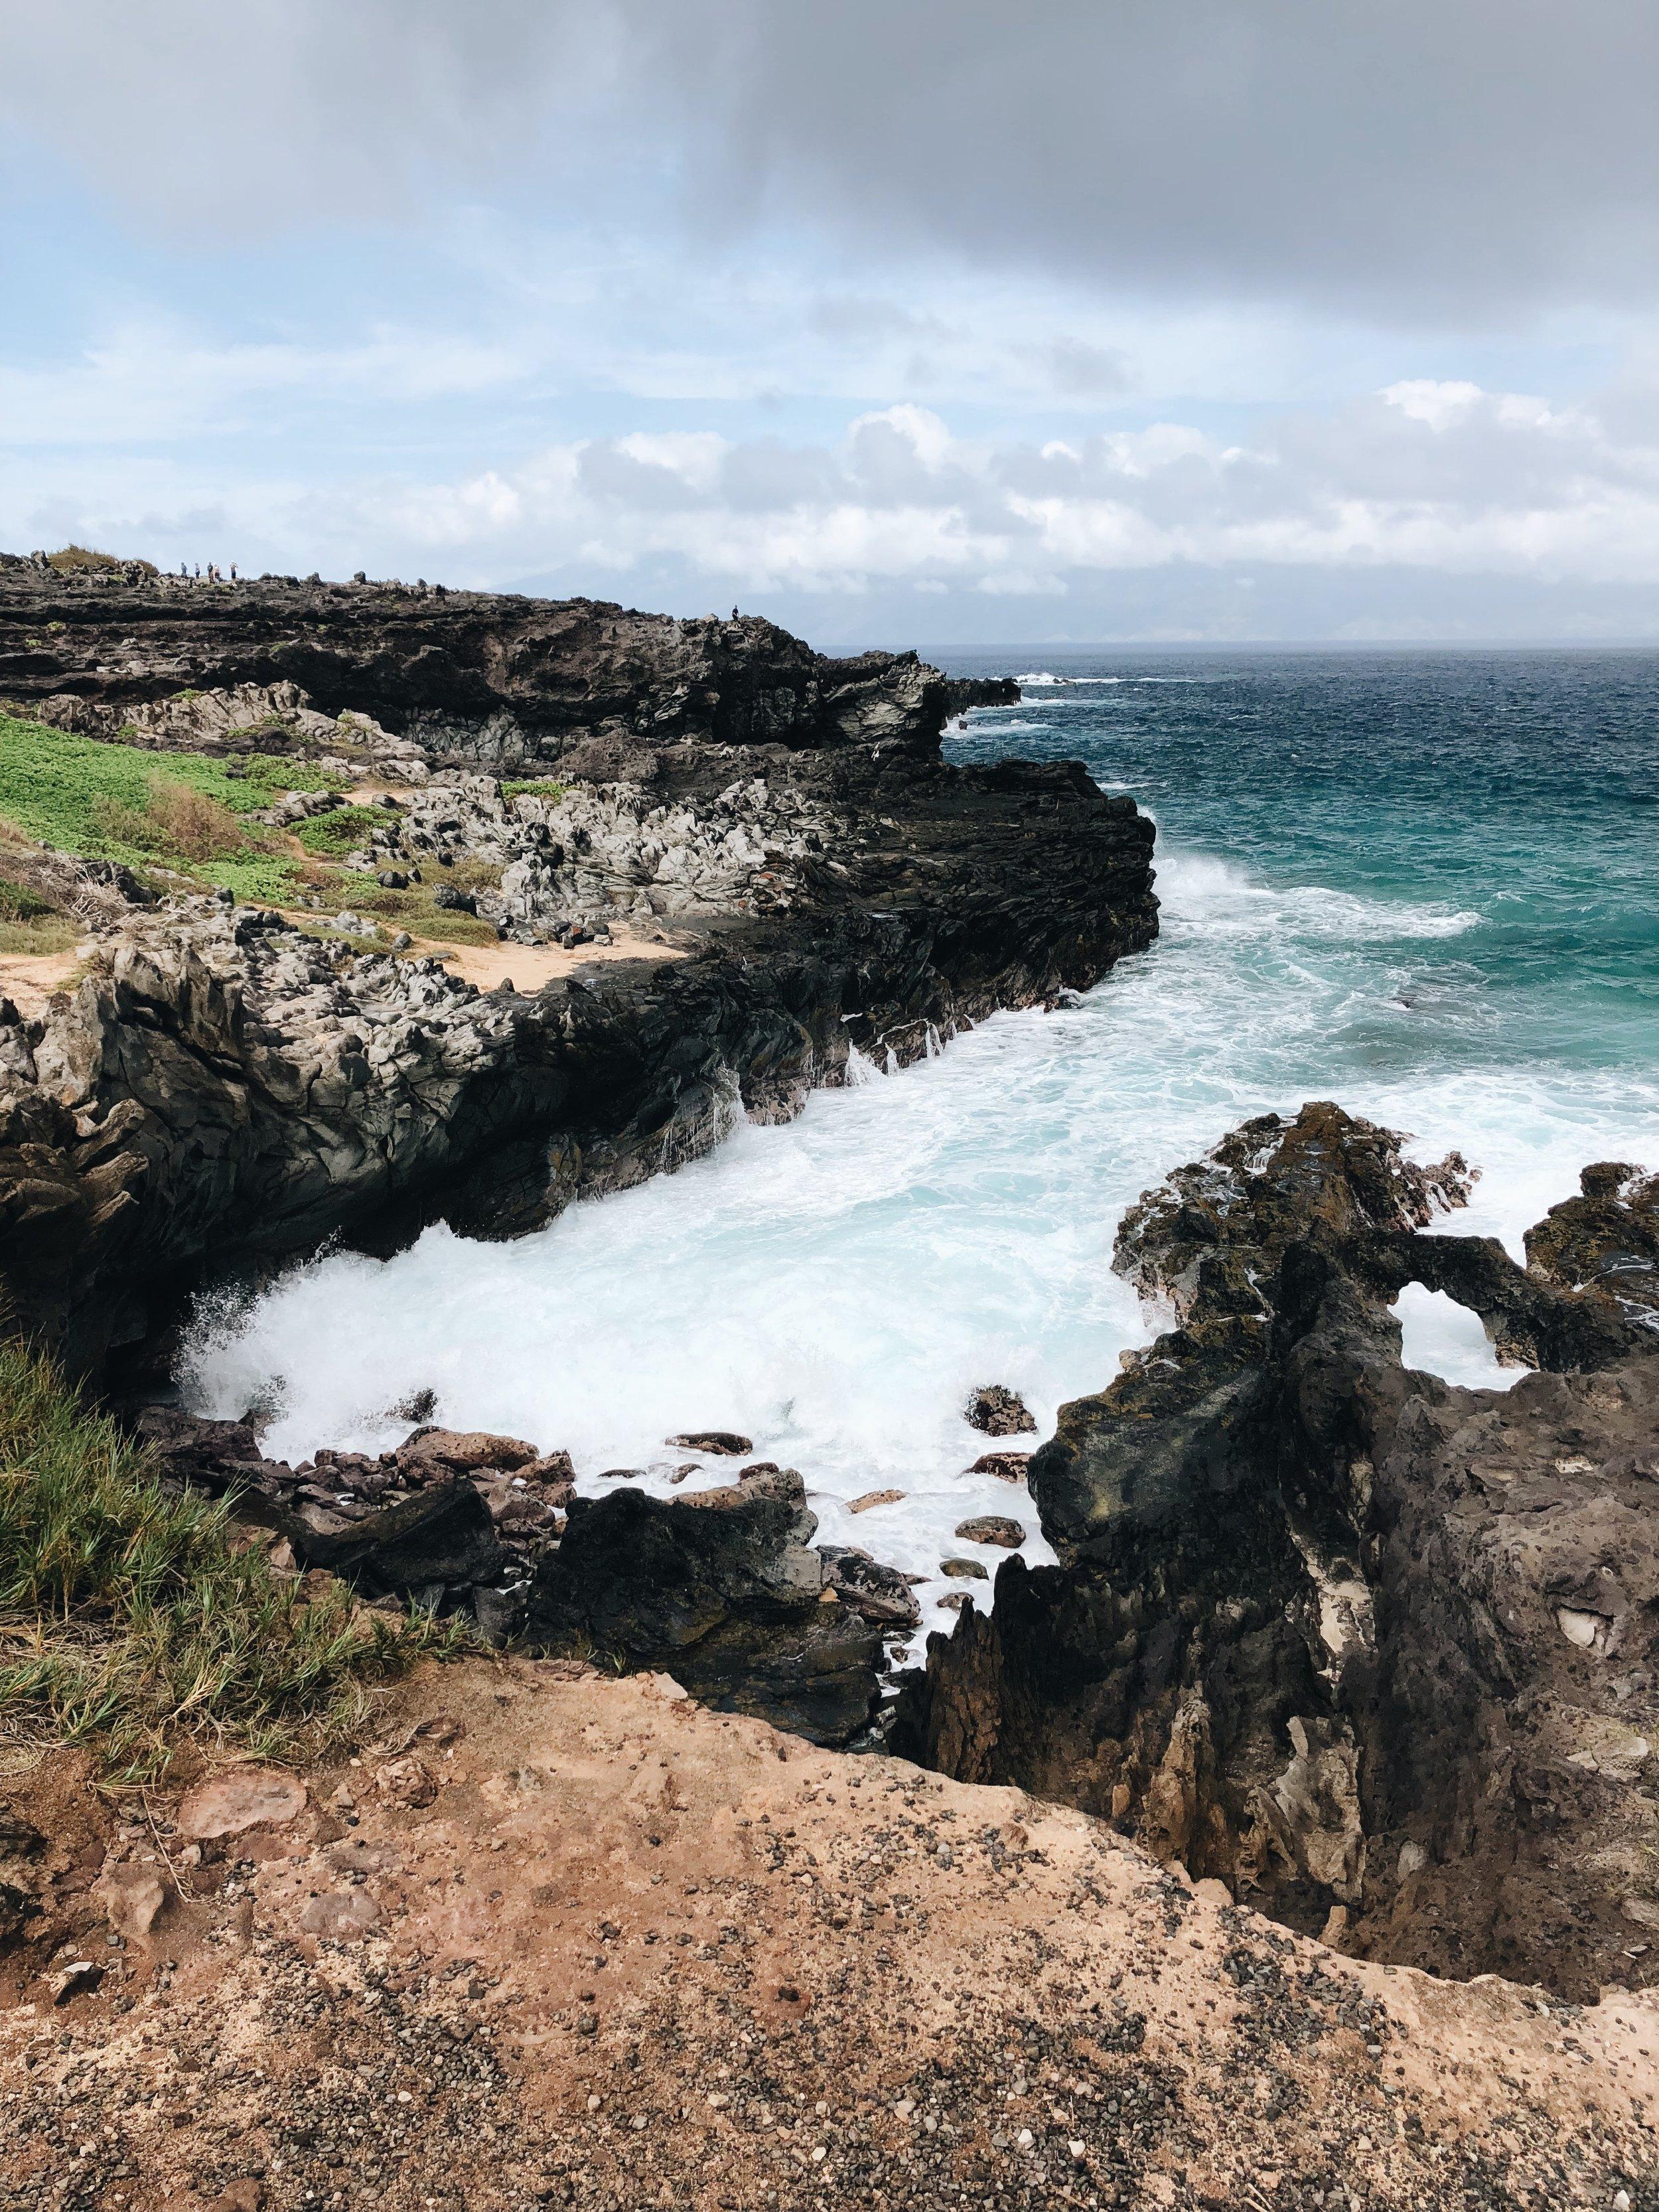 Walking along the Kapalua Coastal Trail to Makaluapuna Point (Dragon's Teeth)